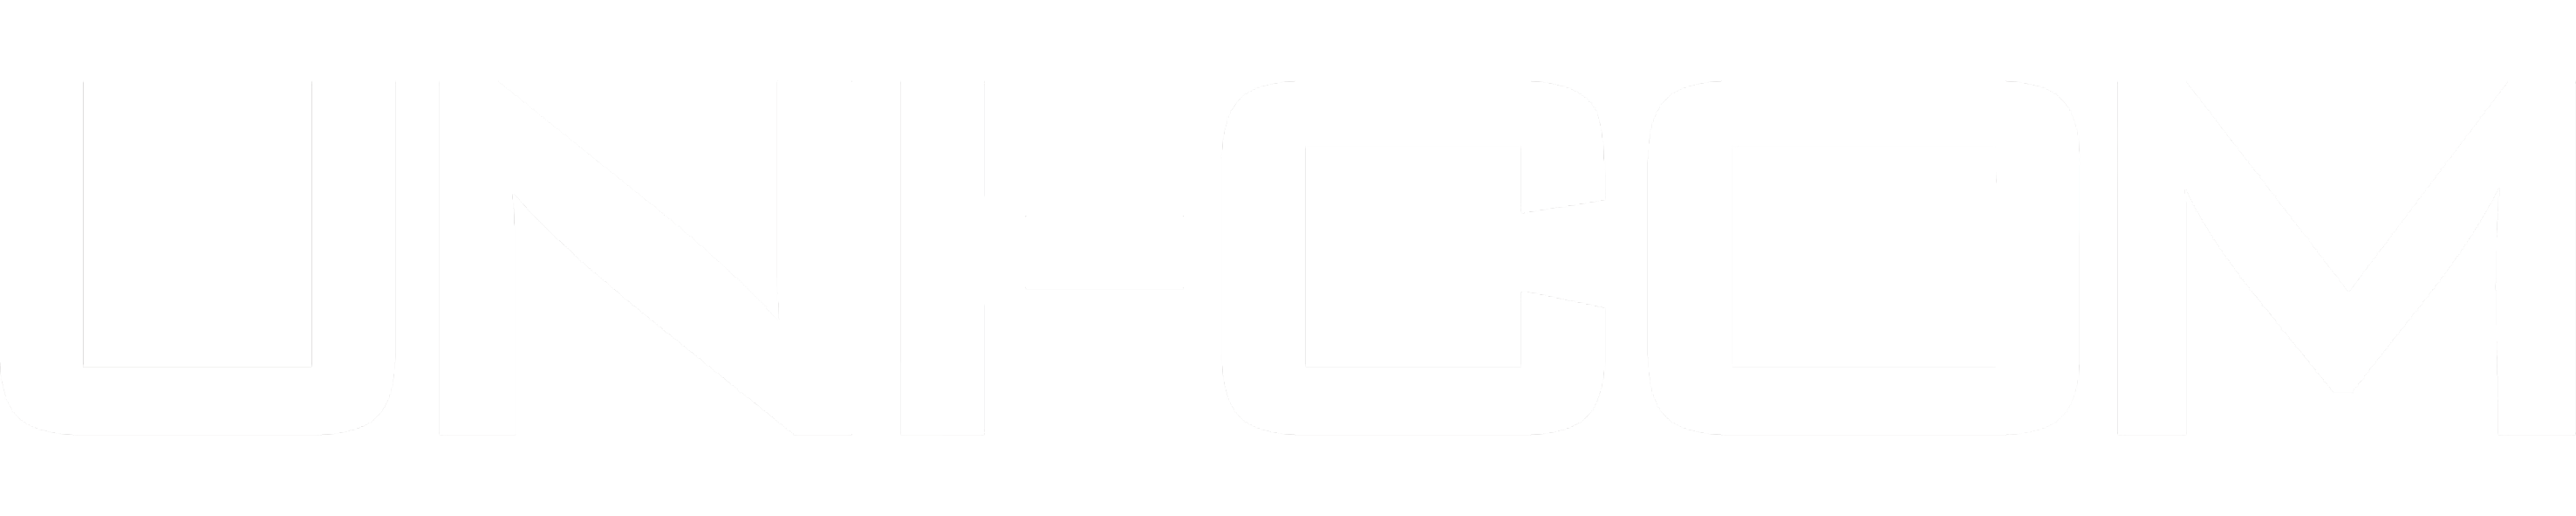 Uni-Com Battery Operated Head Torch Black